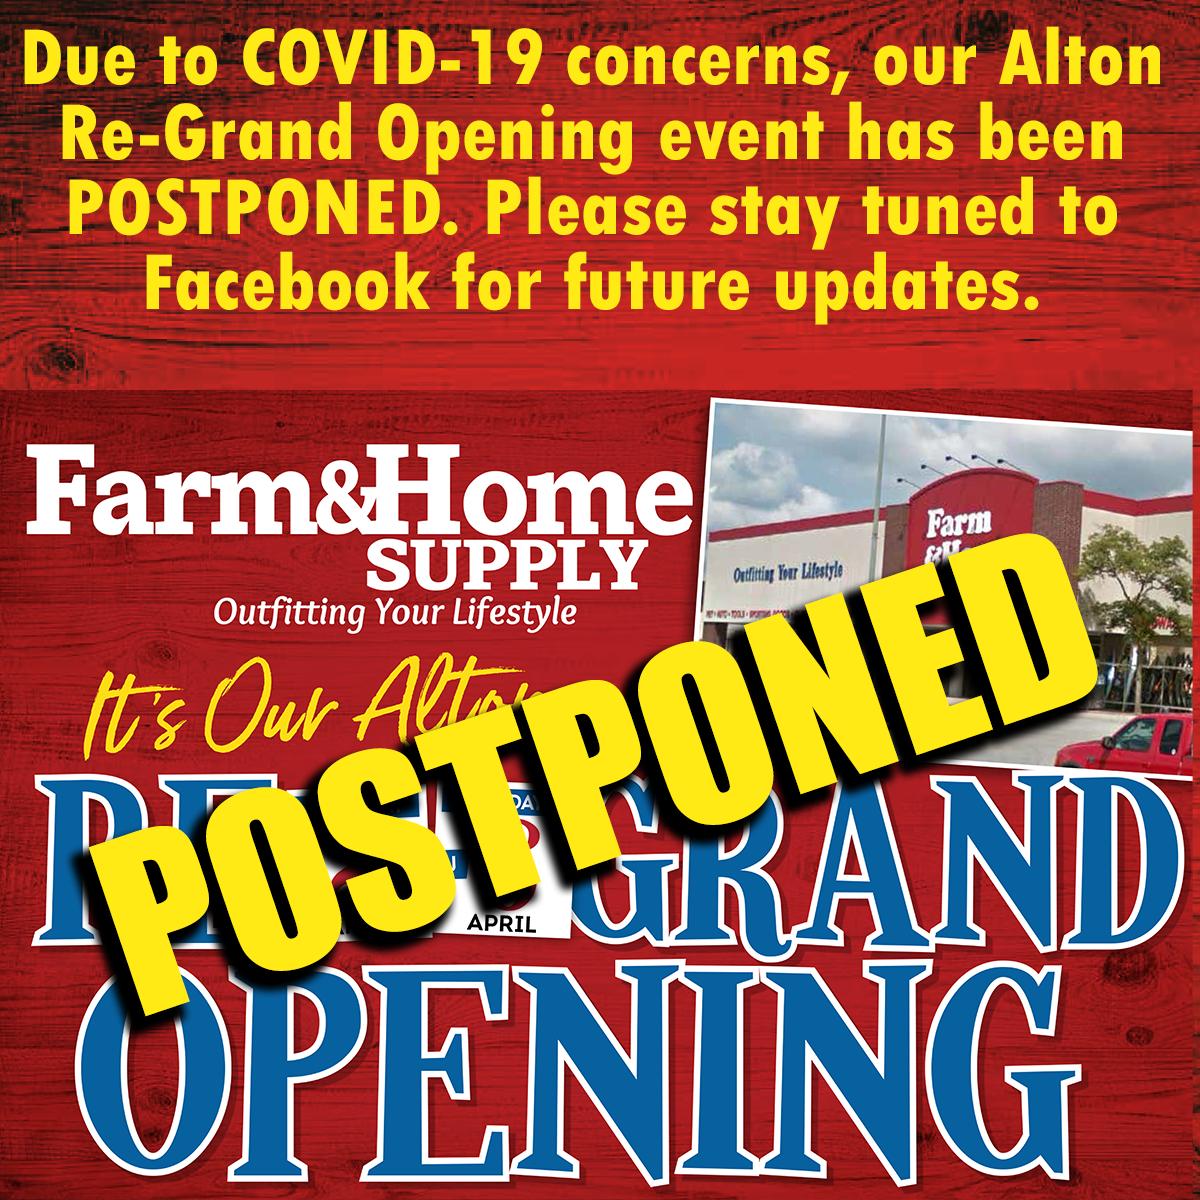 Alton RGO Postponed